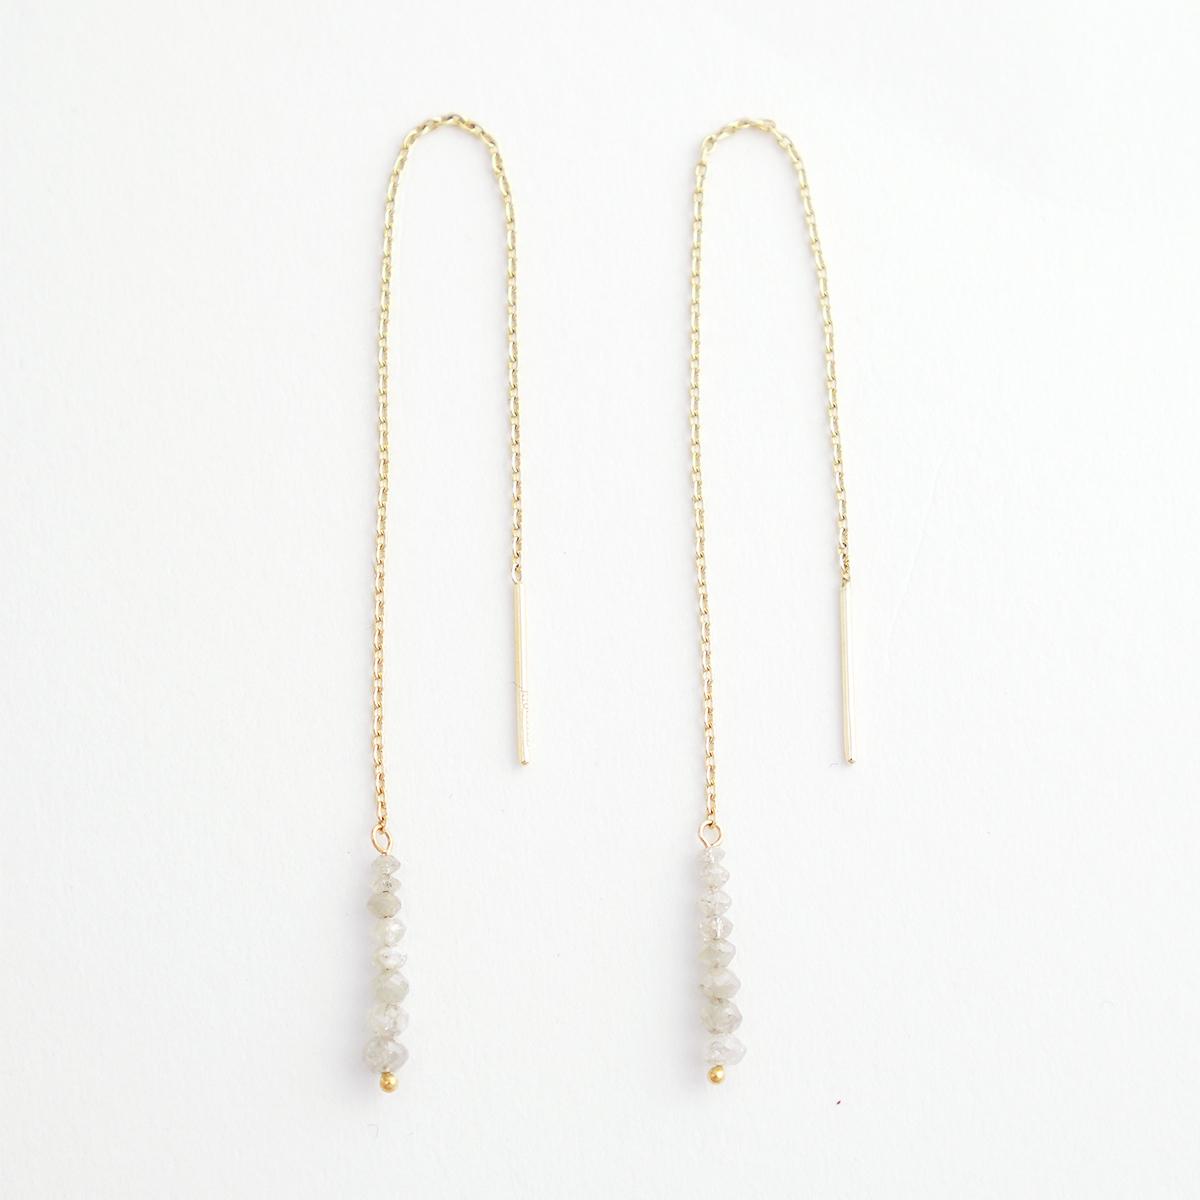 Off-white diamond pierce